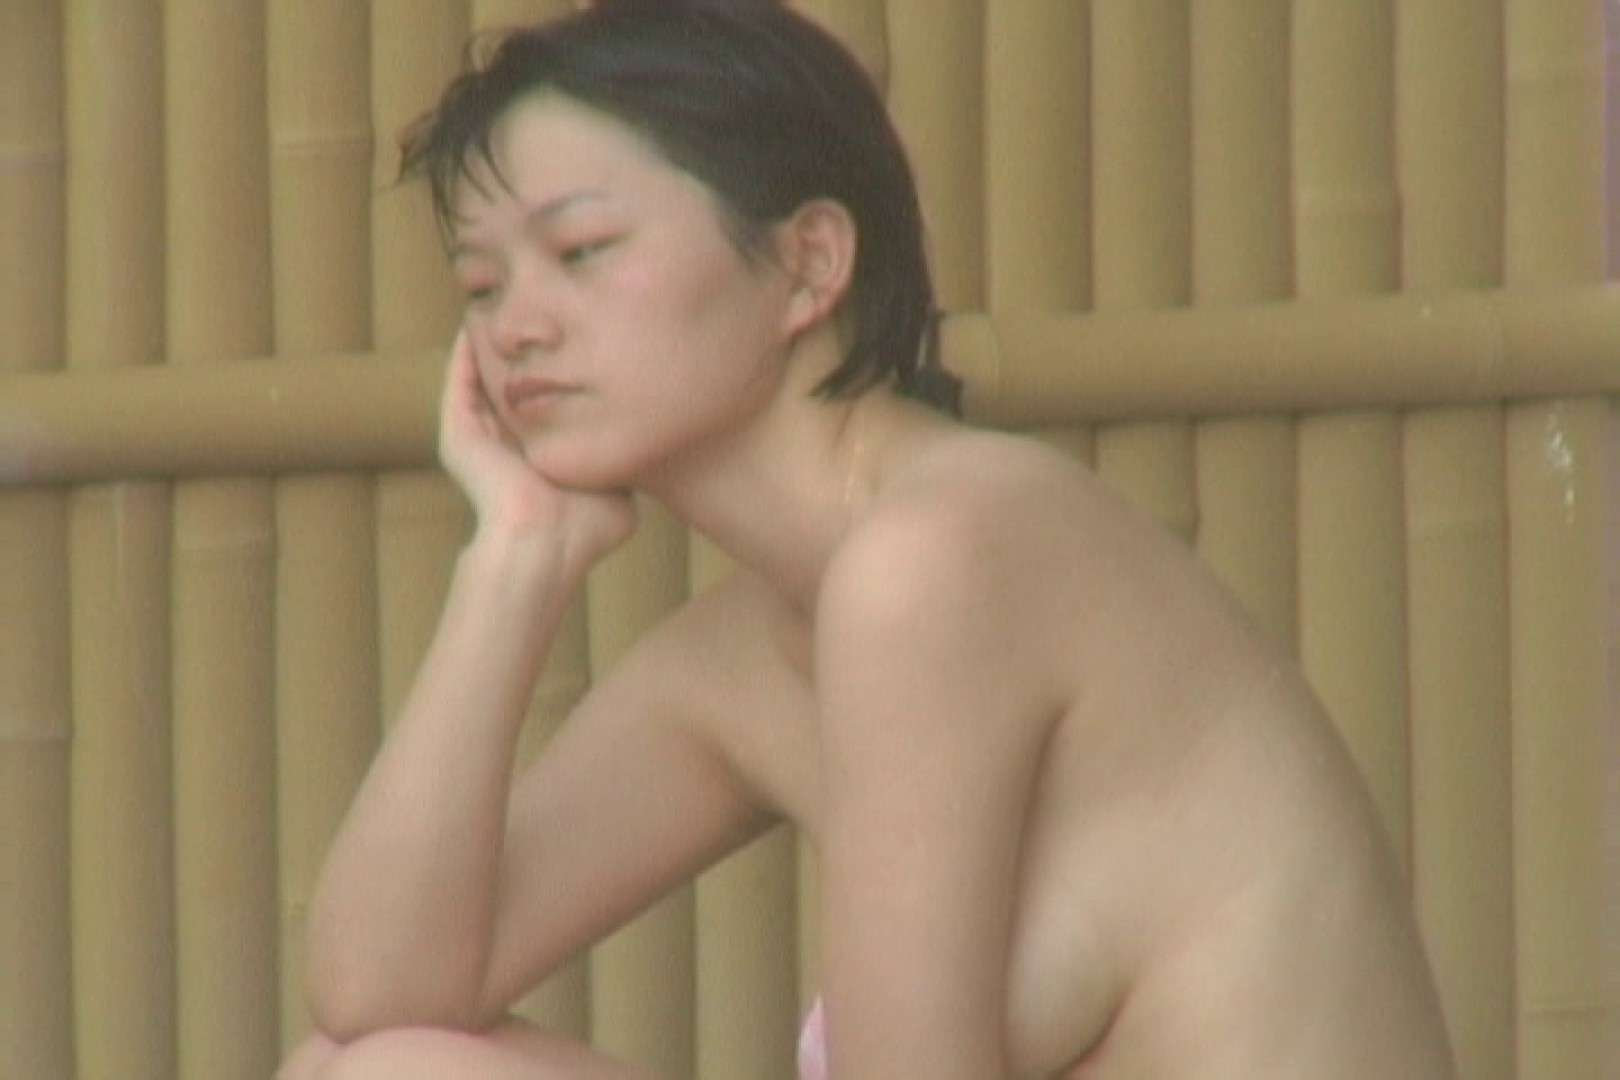 Aquaな露天風呂Vol.116 盗撮映像  42Pix 38